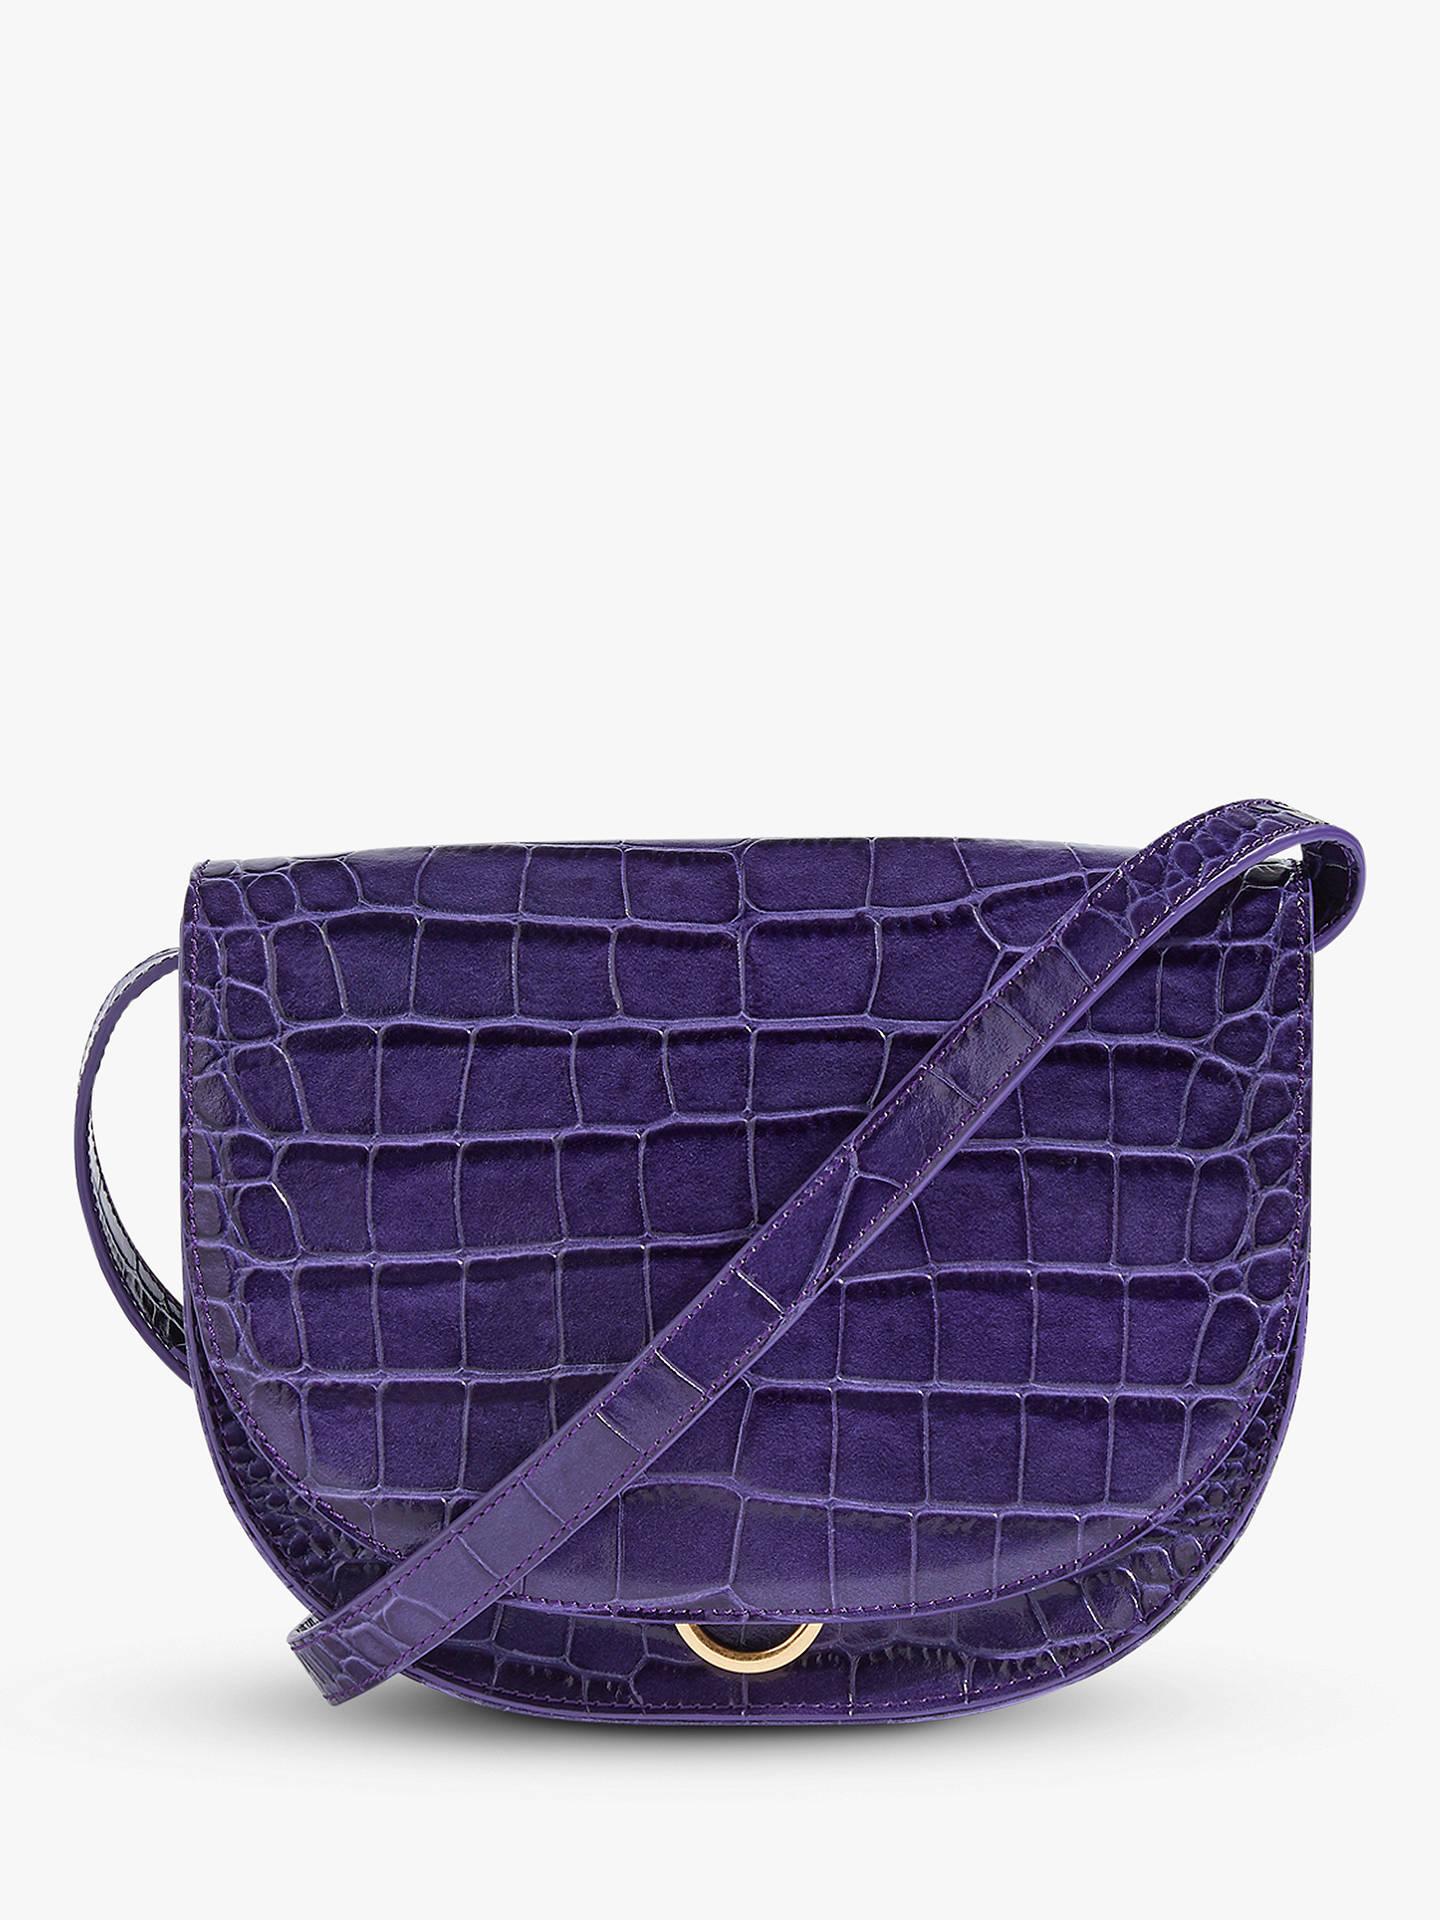 967f184c1 Buy Jigsaw Croc Leather Saddle Bag, Purple Online at johnlewis.com ...